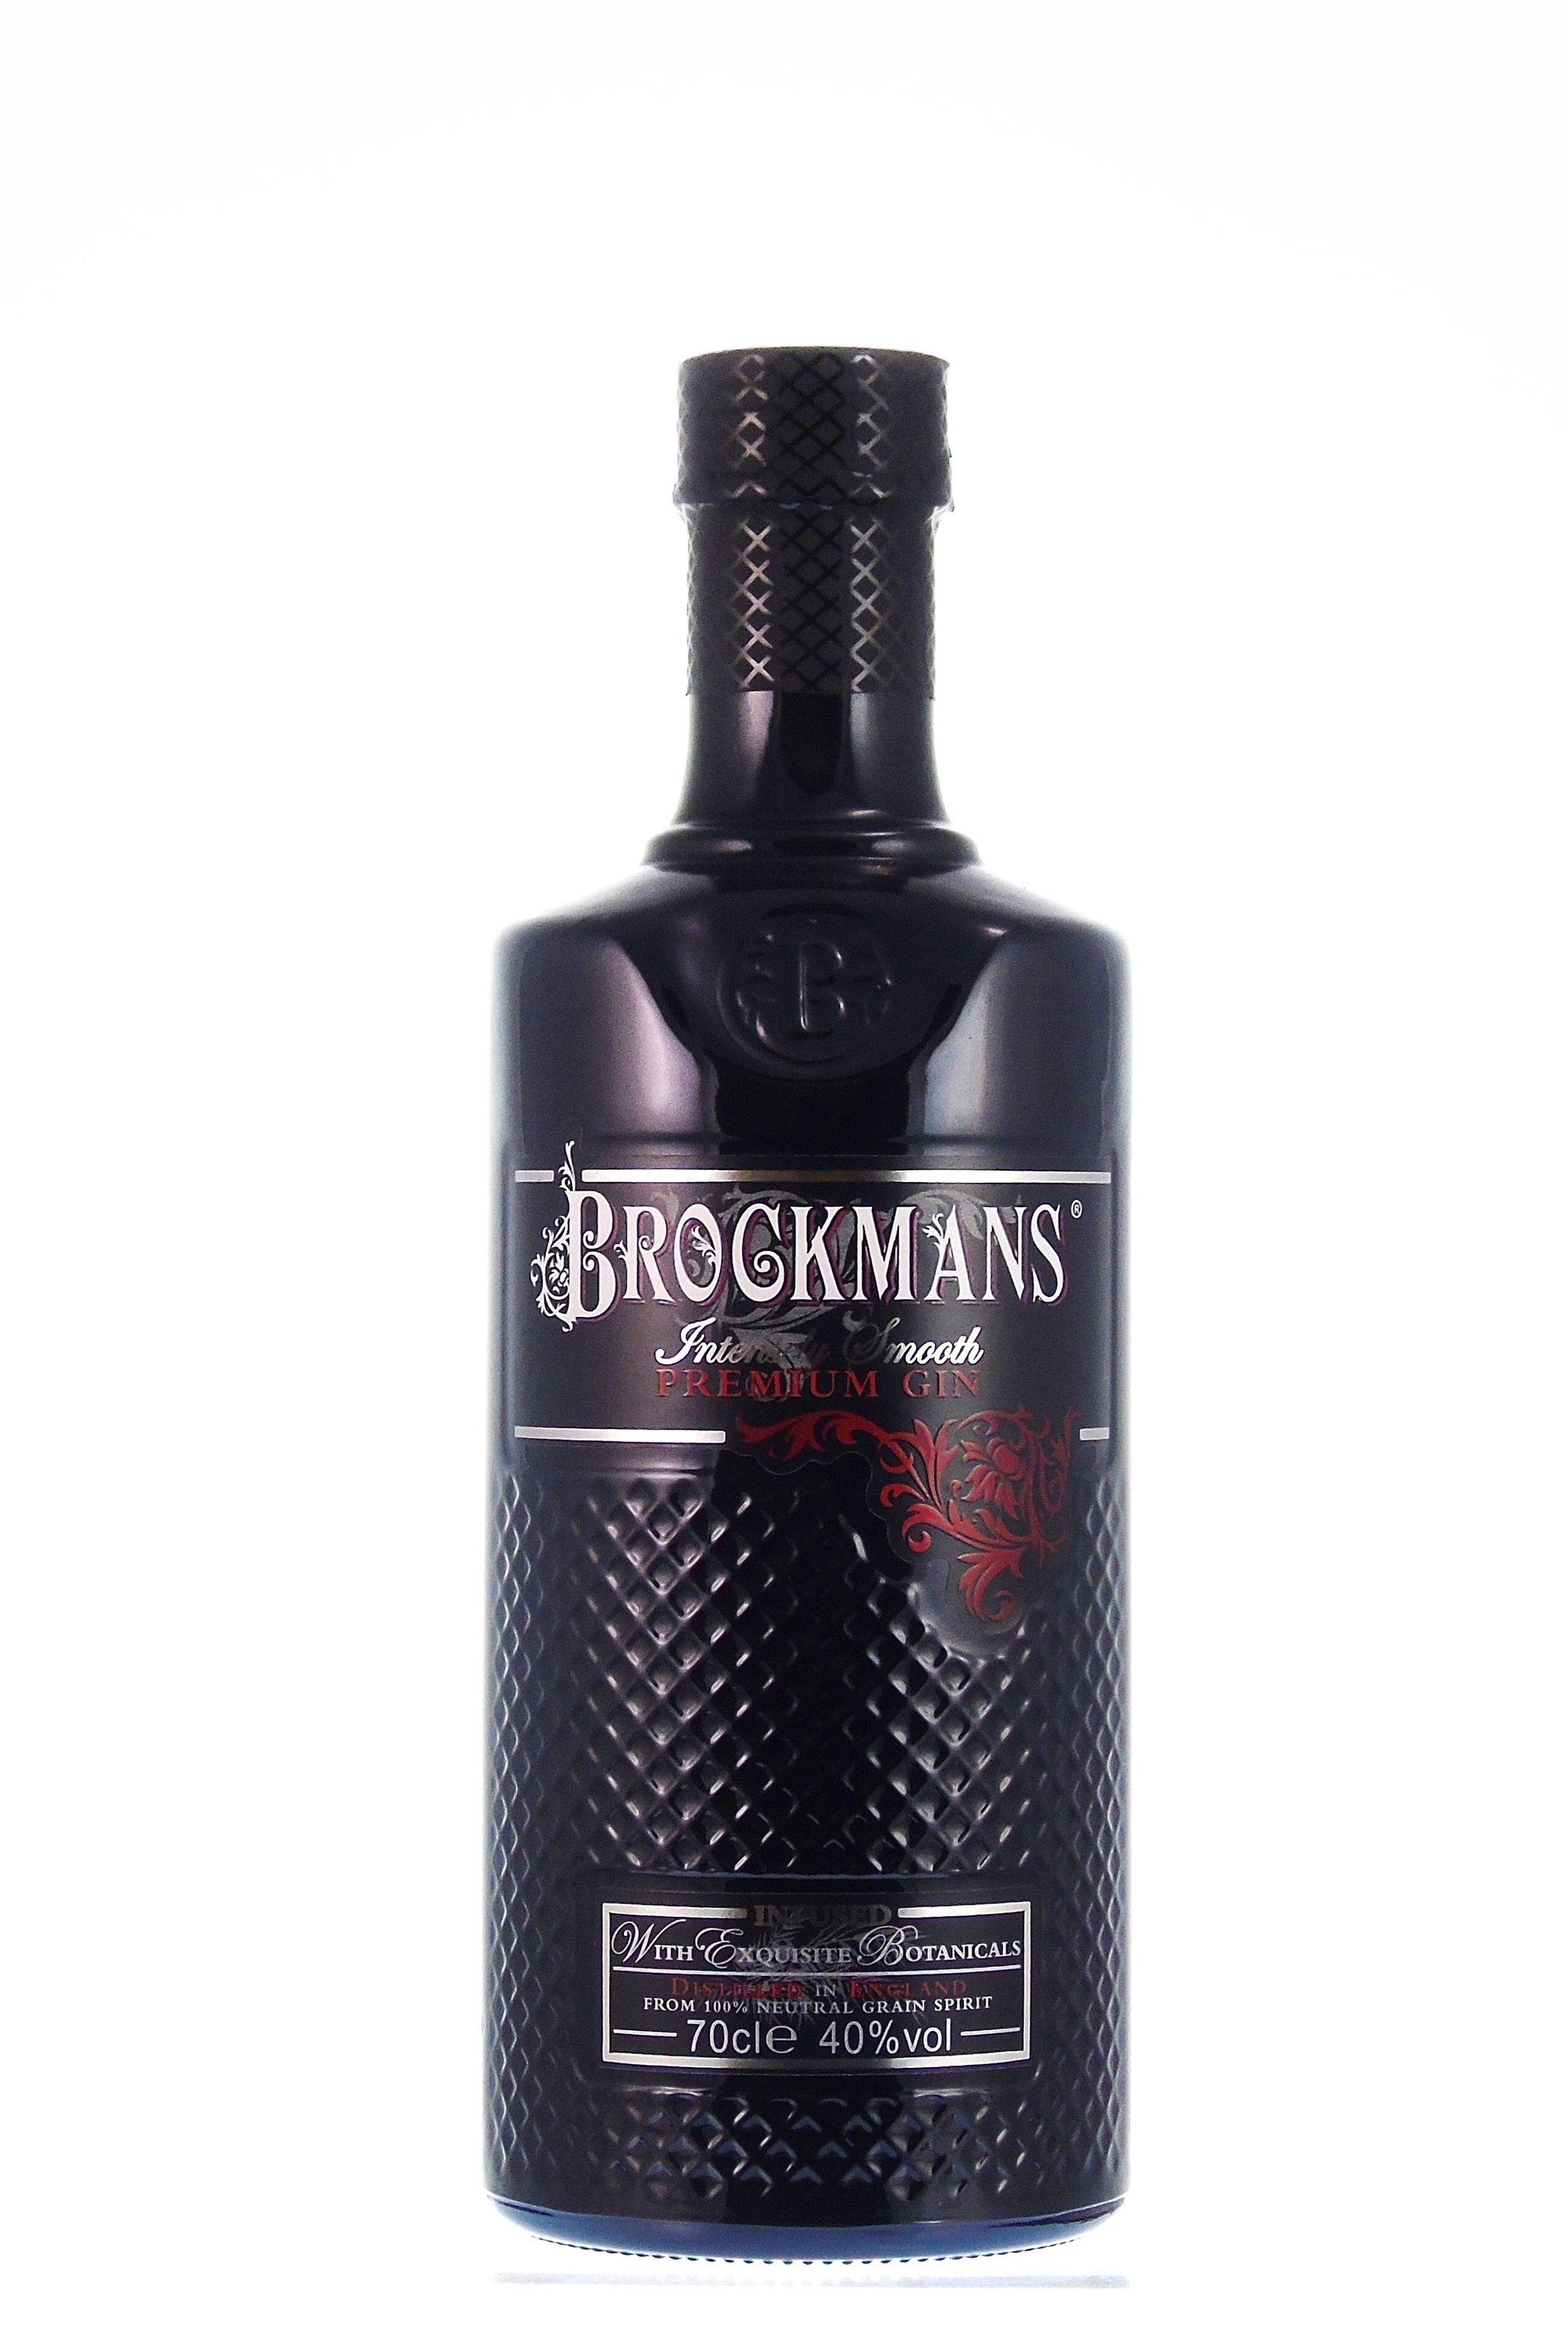 Brockmans Gin Gins & Gin Liqueurs